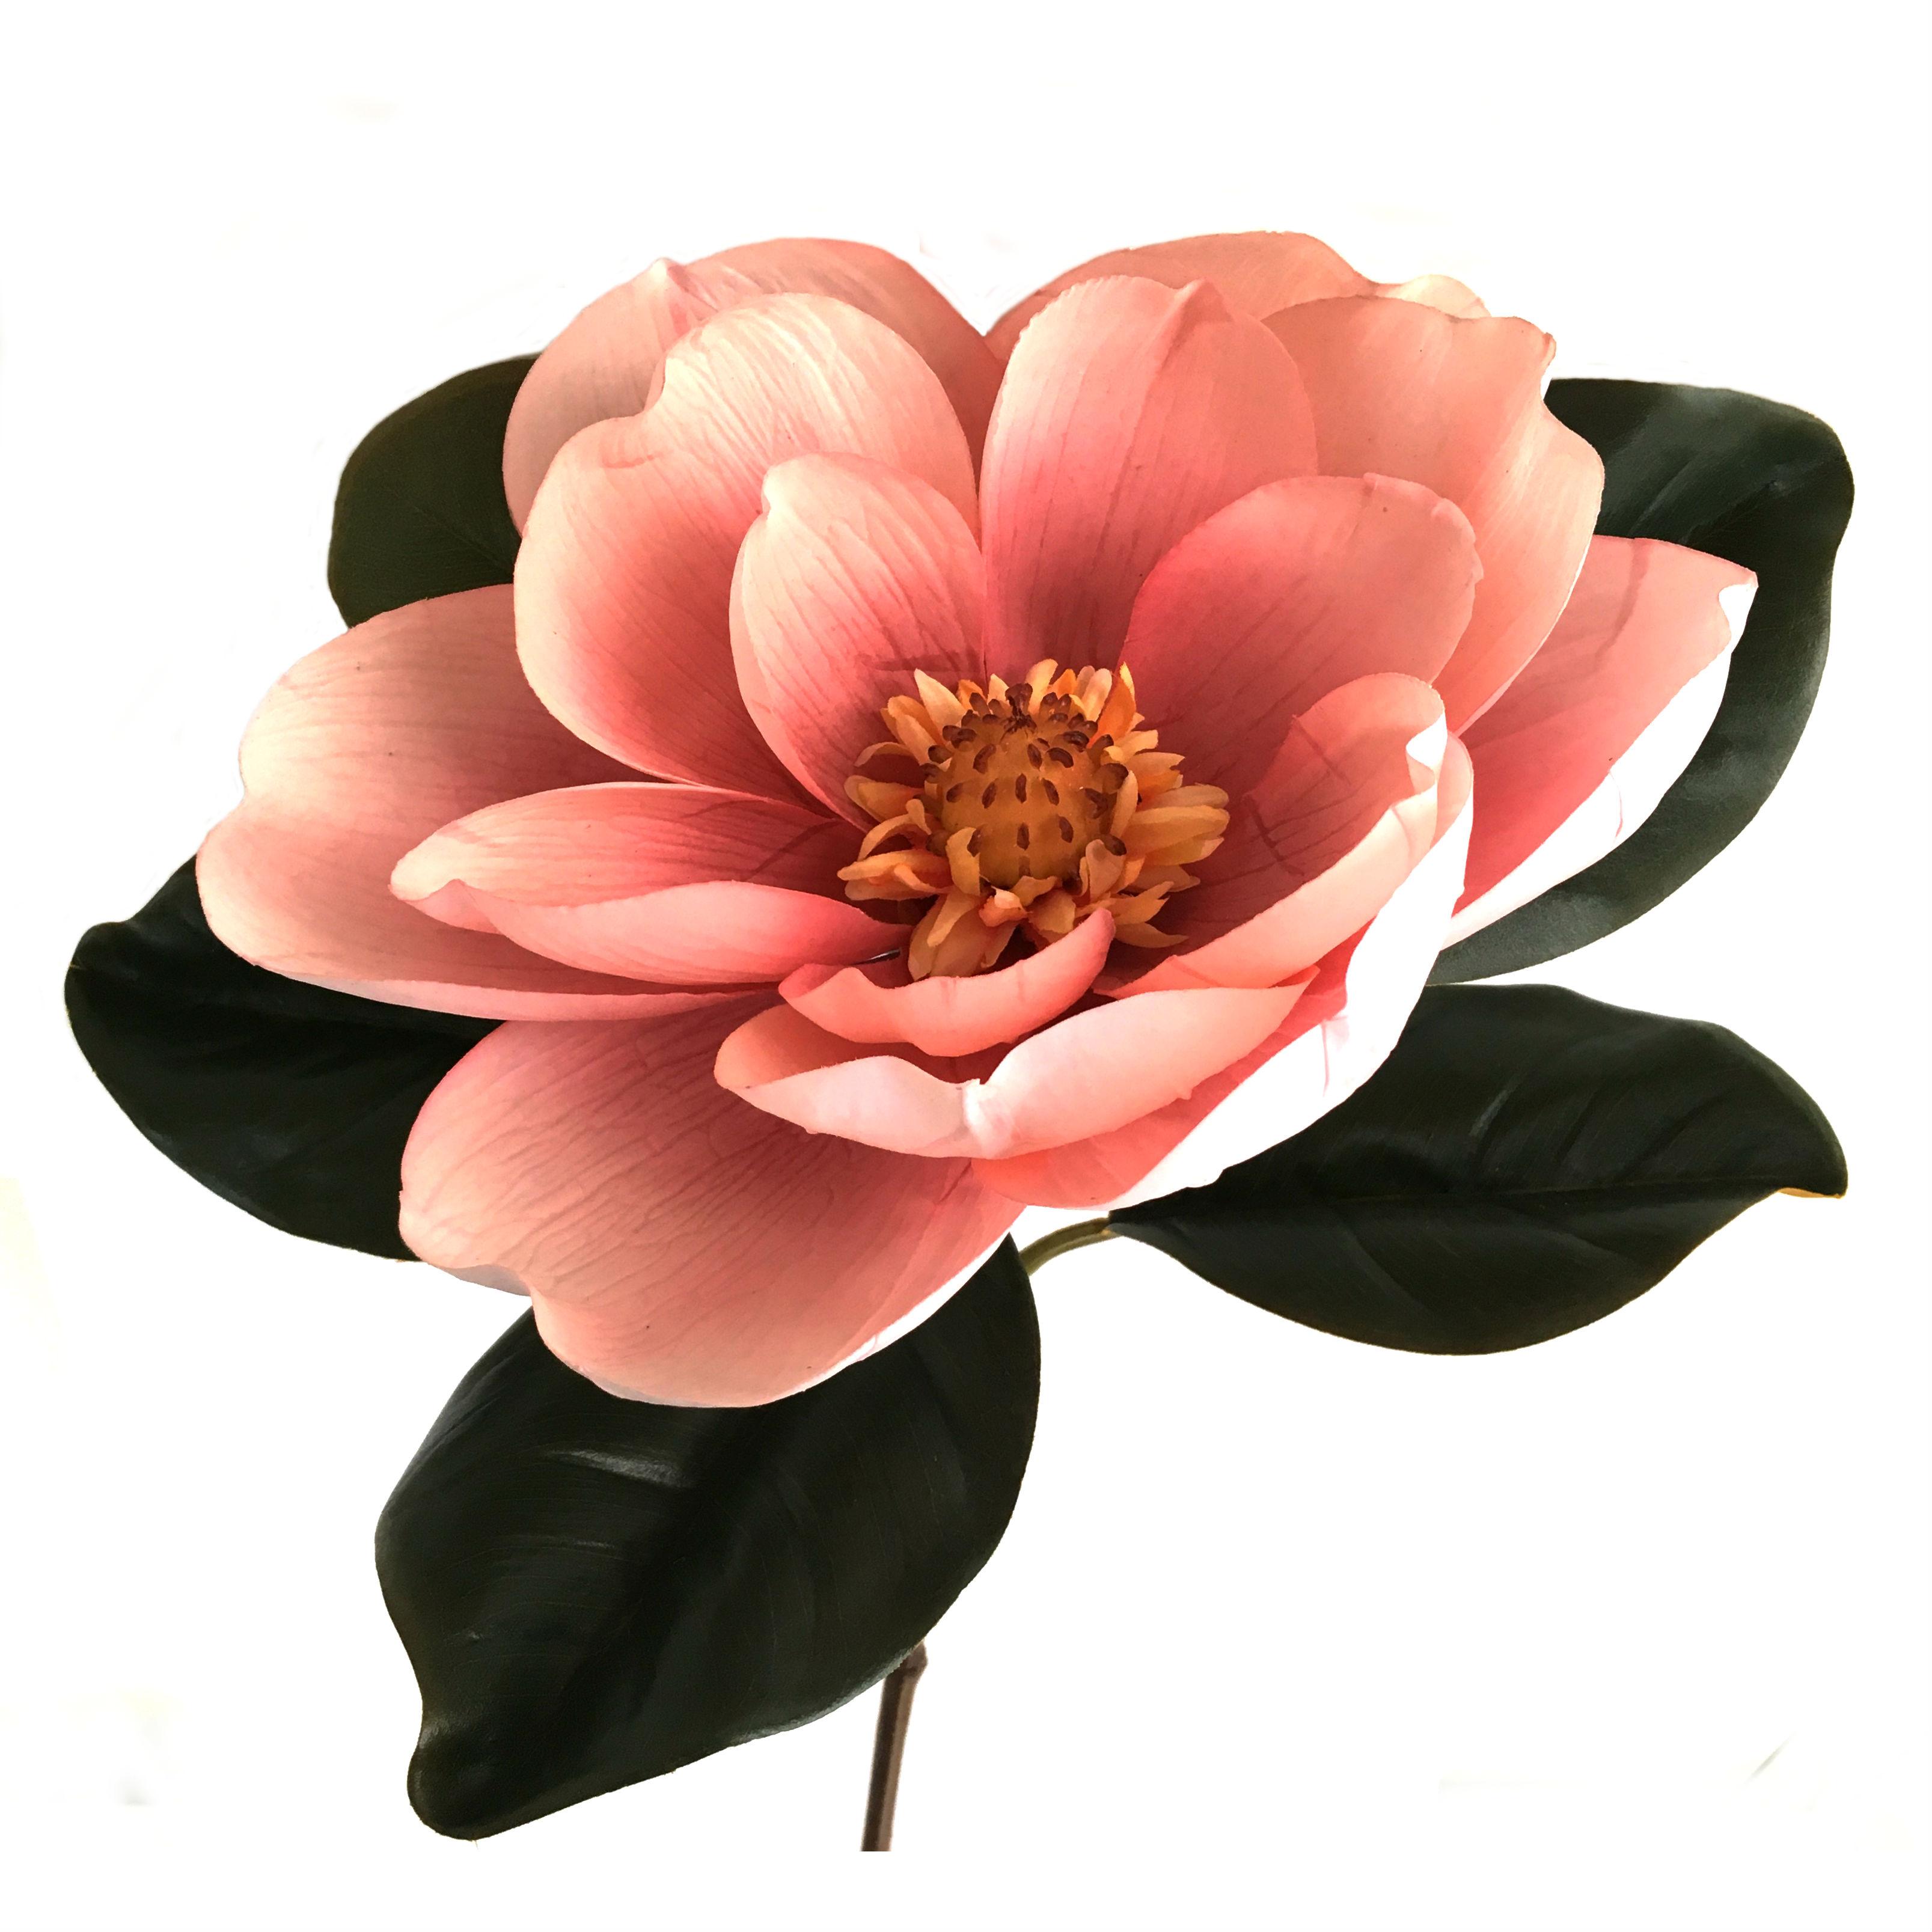 16756_magnolia_gigant_lysrosa1